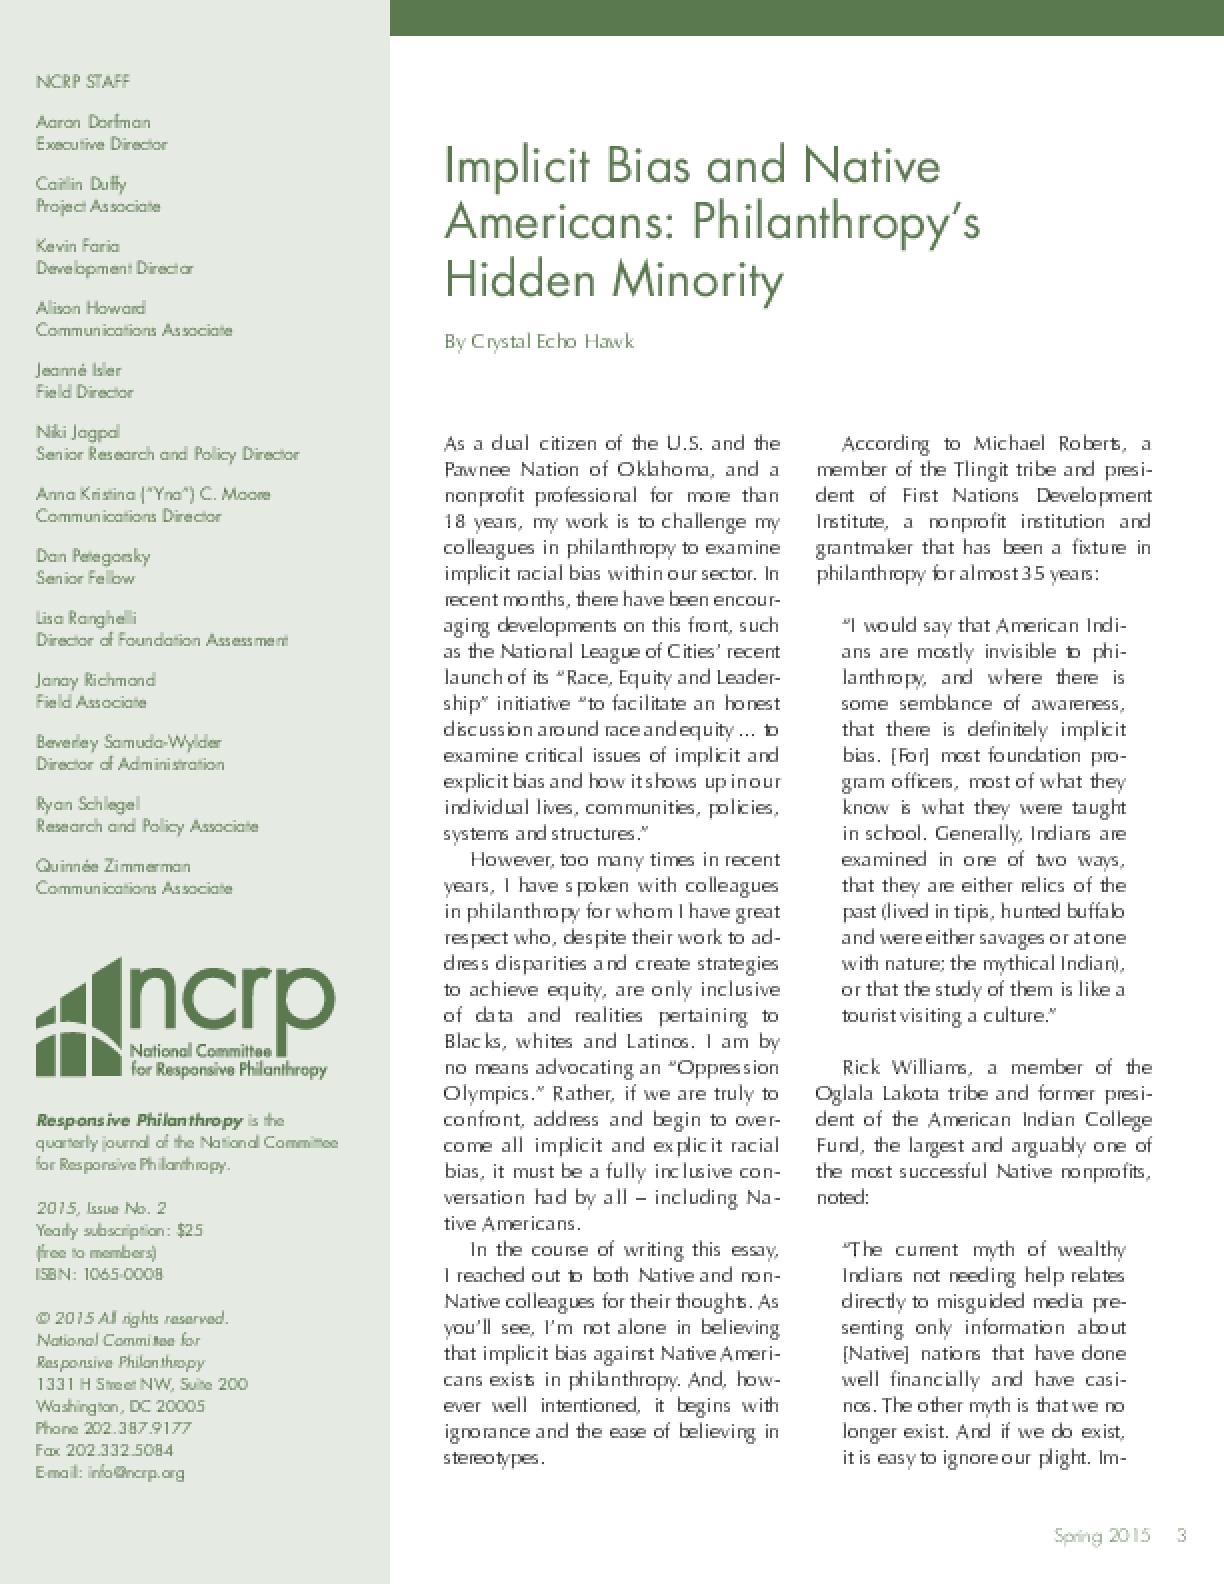 Implicit Bias and Native Americans: Philanthropy's Hidden Minority